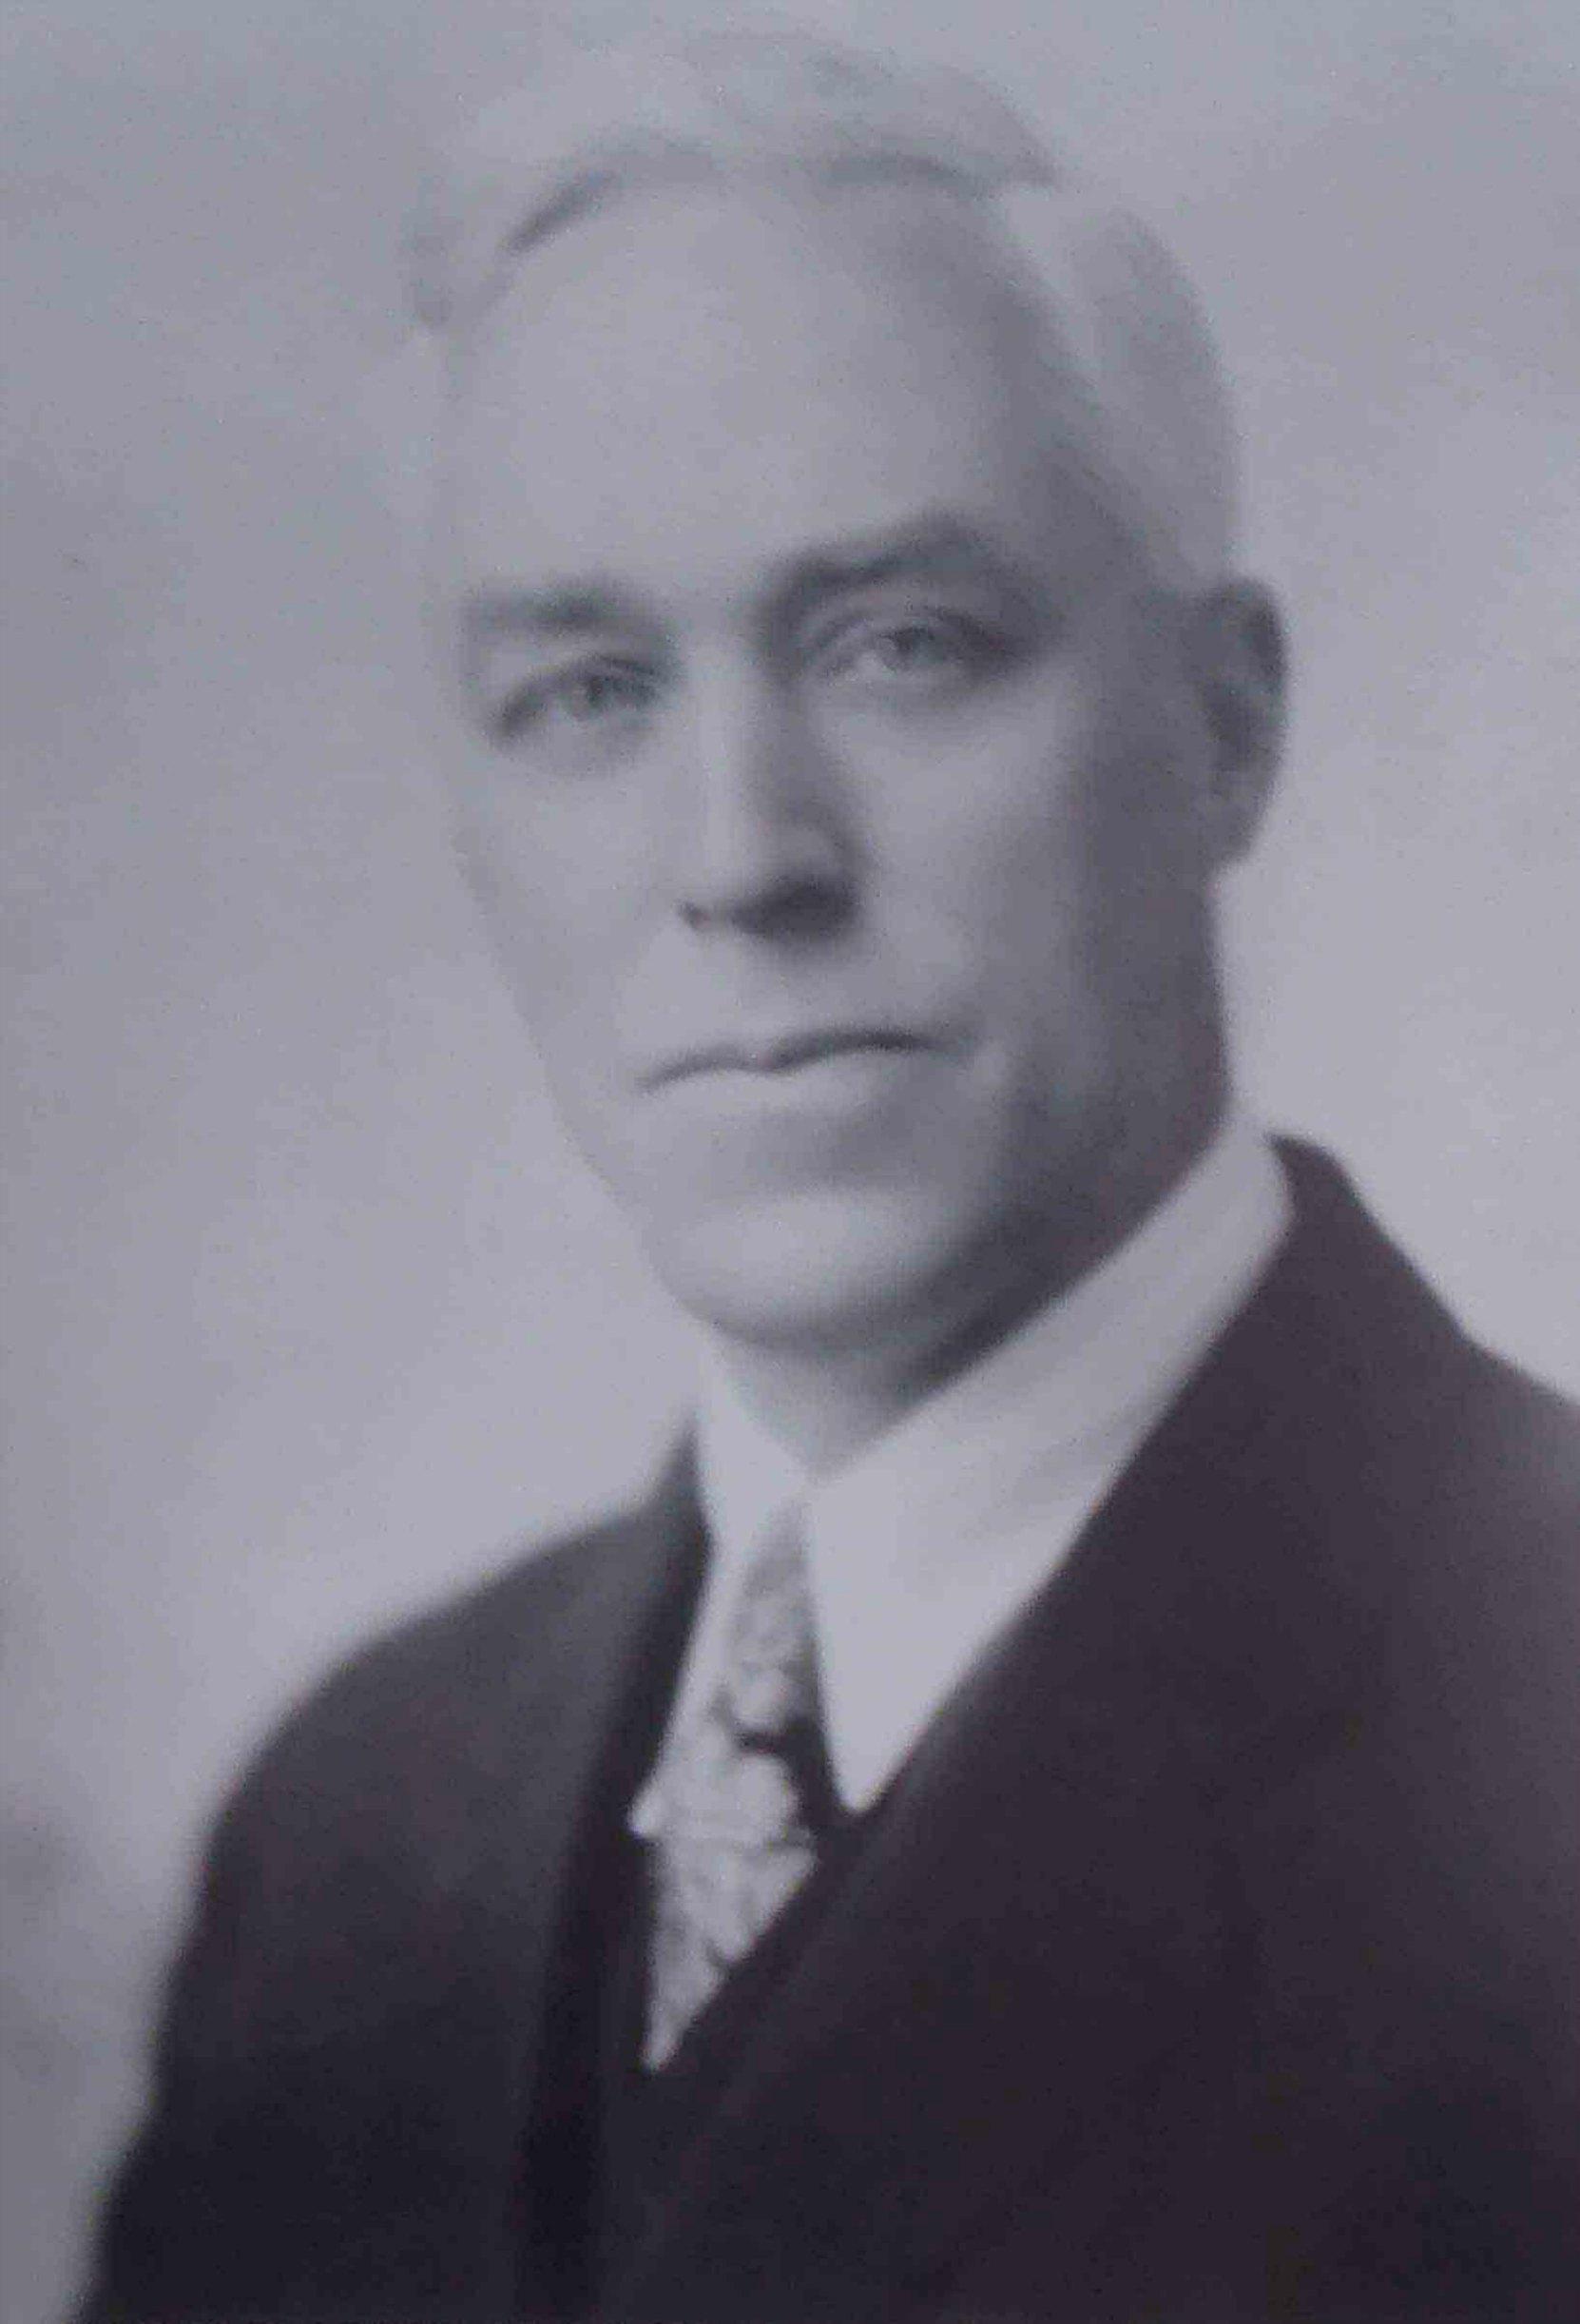 Harold Fairfax Prevost, circa 1930 as Mayor of Duncan (Photo courtesy of City of Duncan)